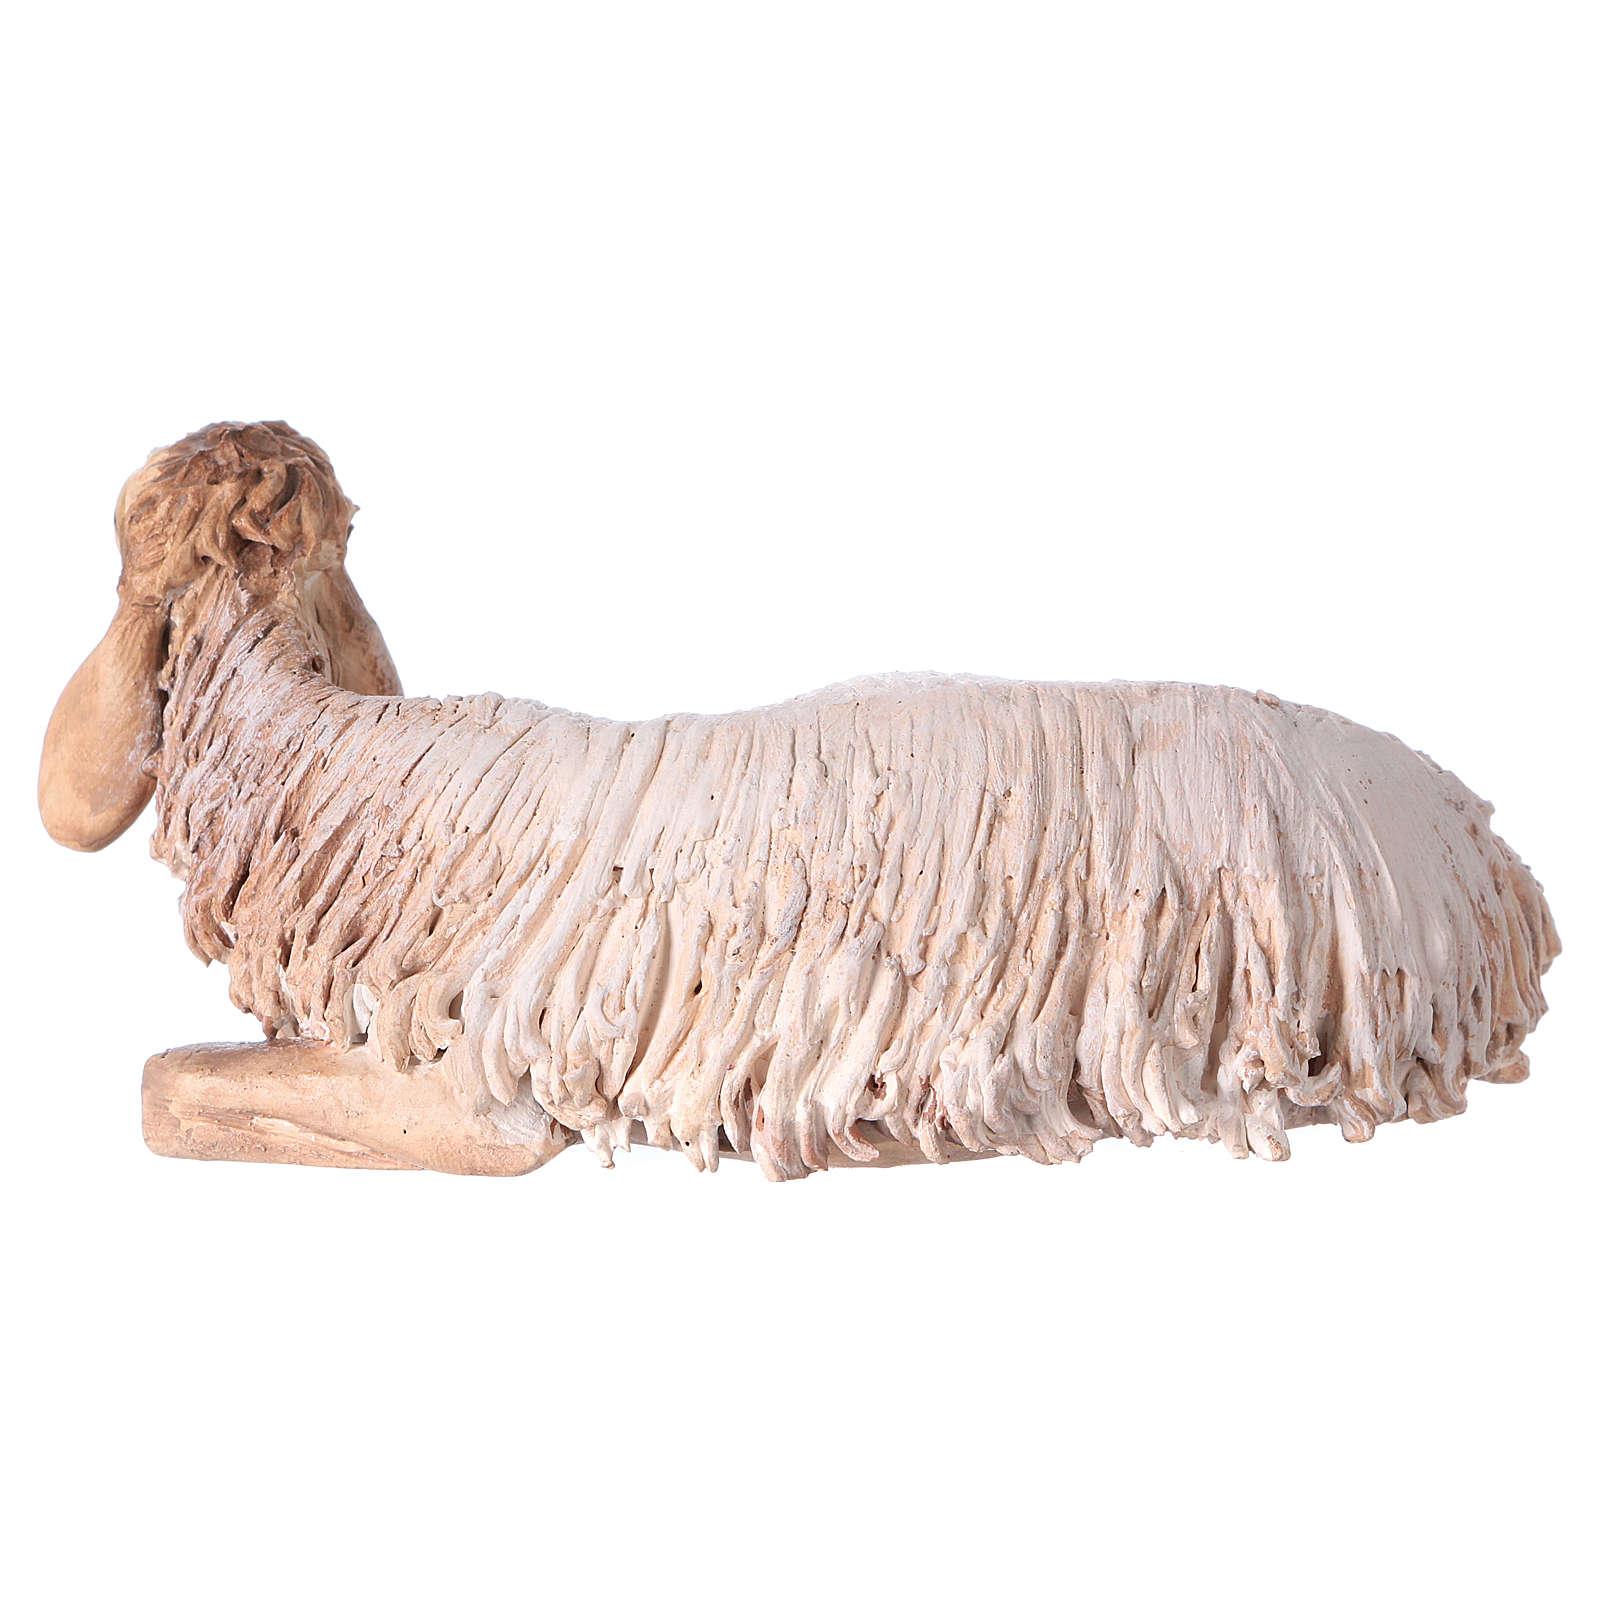 Ovelha agachada 18 cm Angela Tripi terracota 4